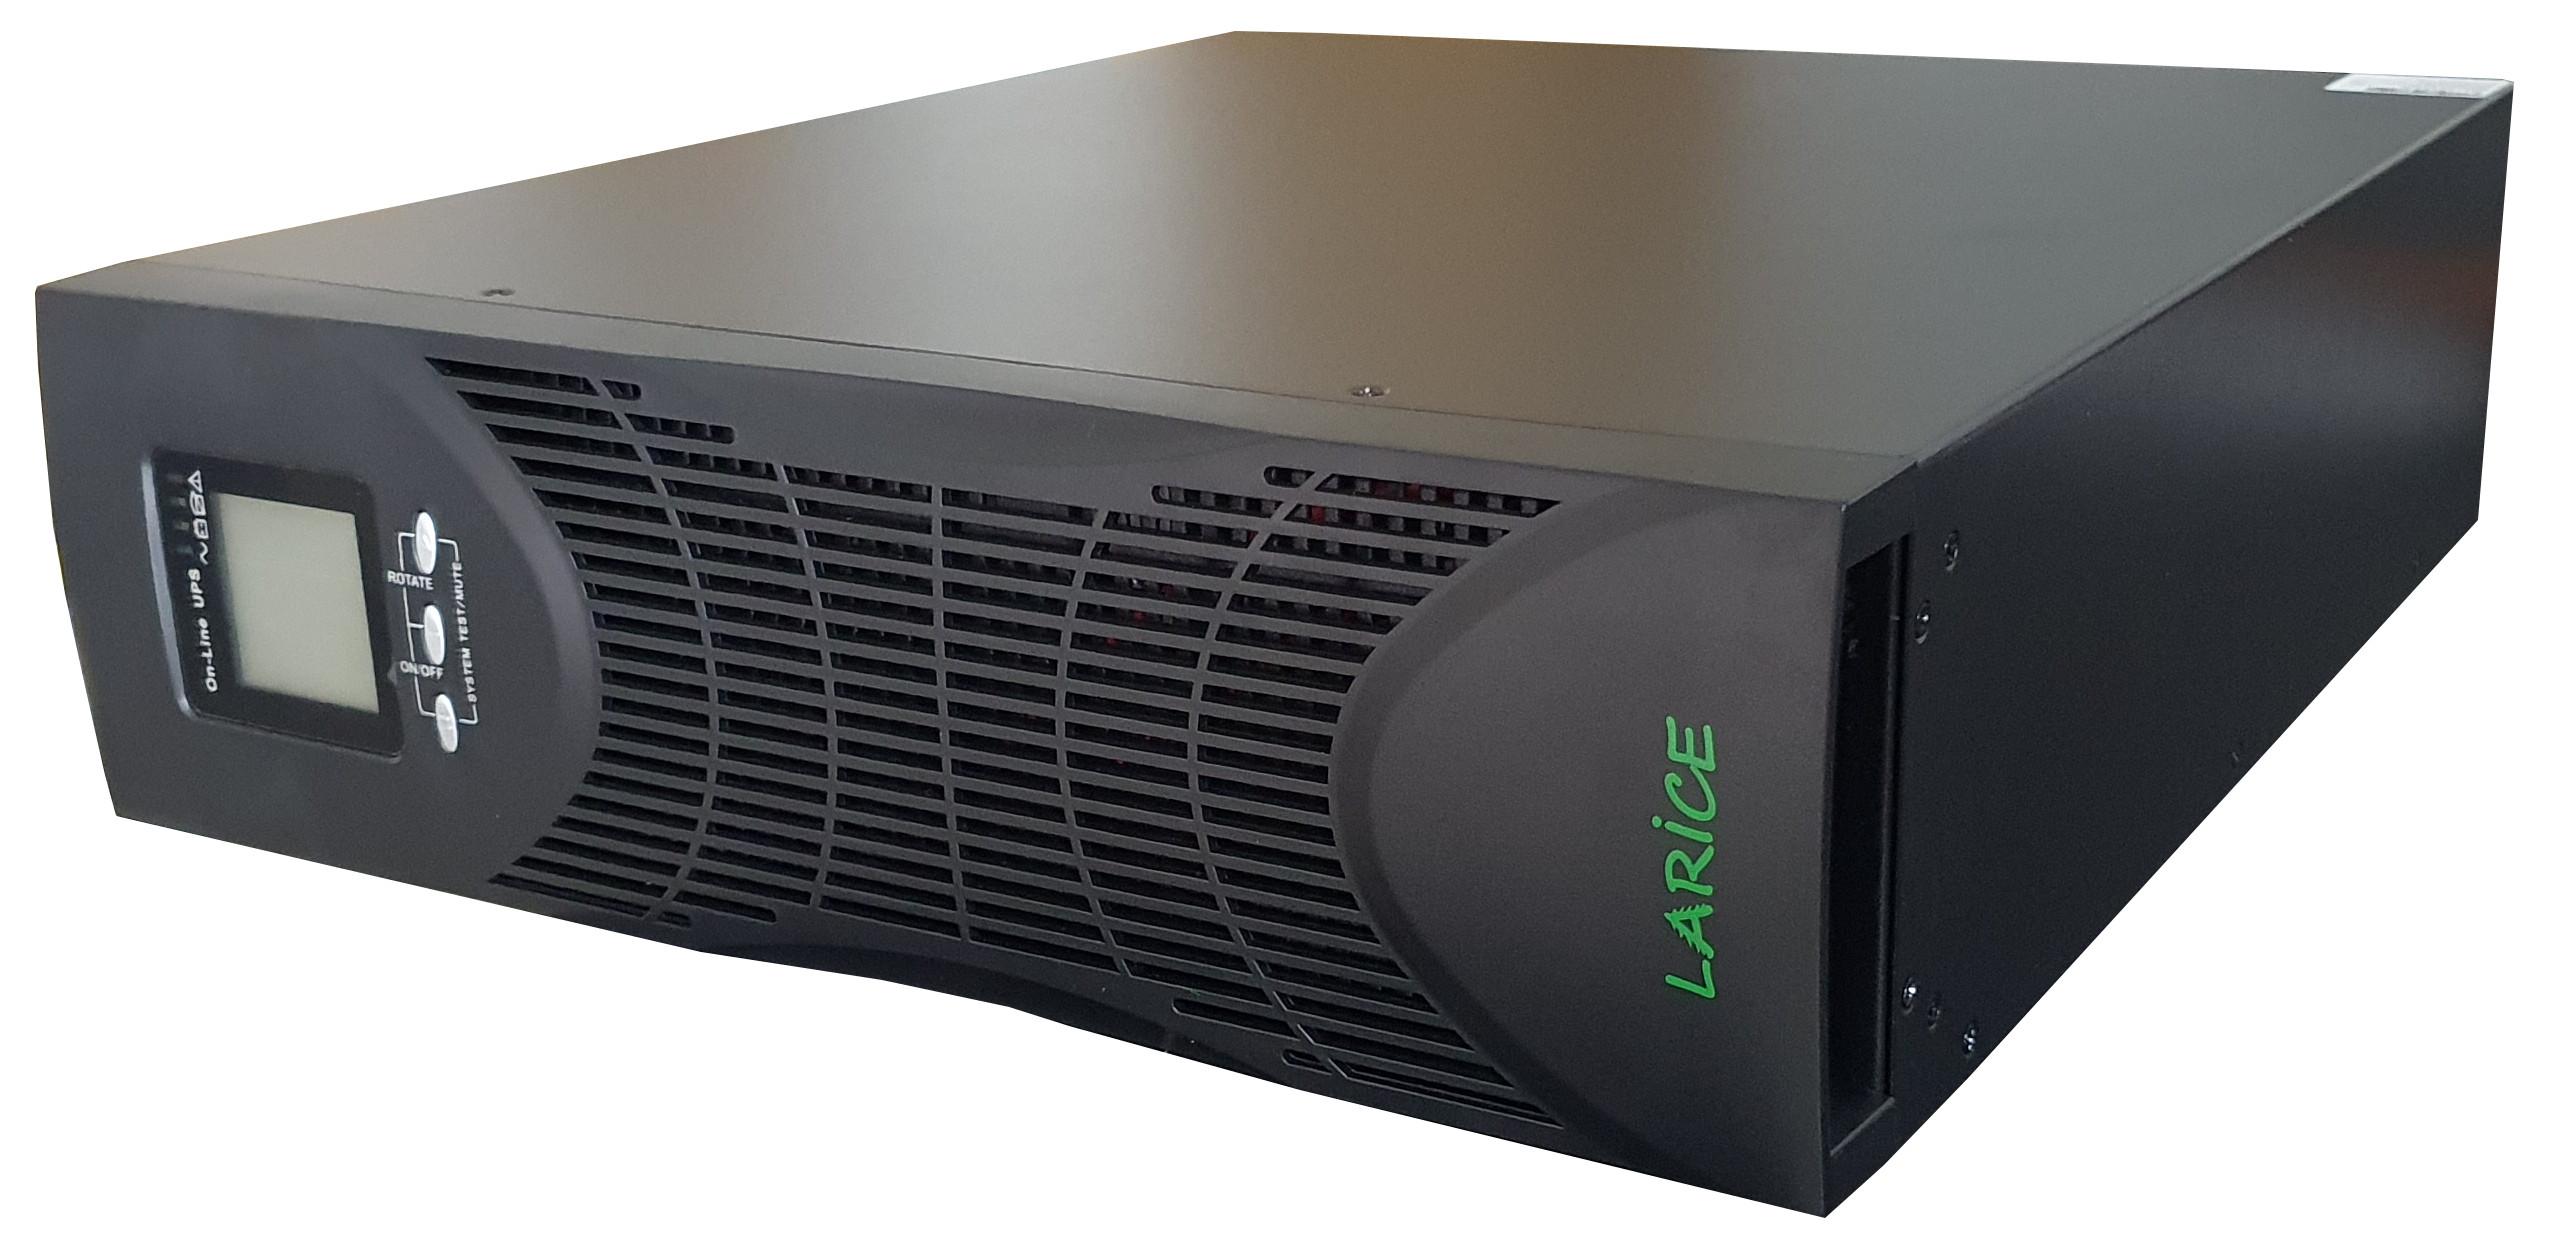 UPS LARICE Online Rack/tower 3000VA/2700W, 6 x 9Ah, 3U 6 IEC | LARICE | MP S RT2 3KVA SV